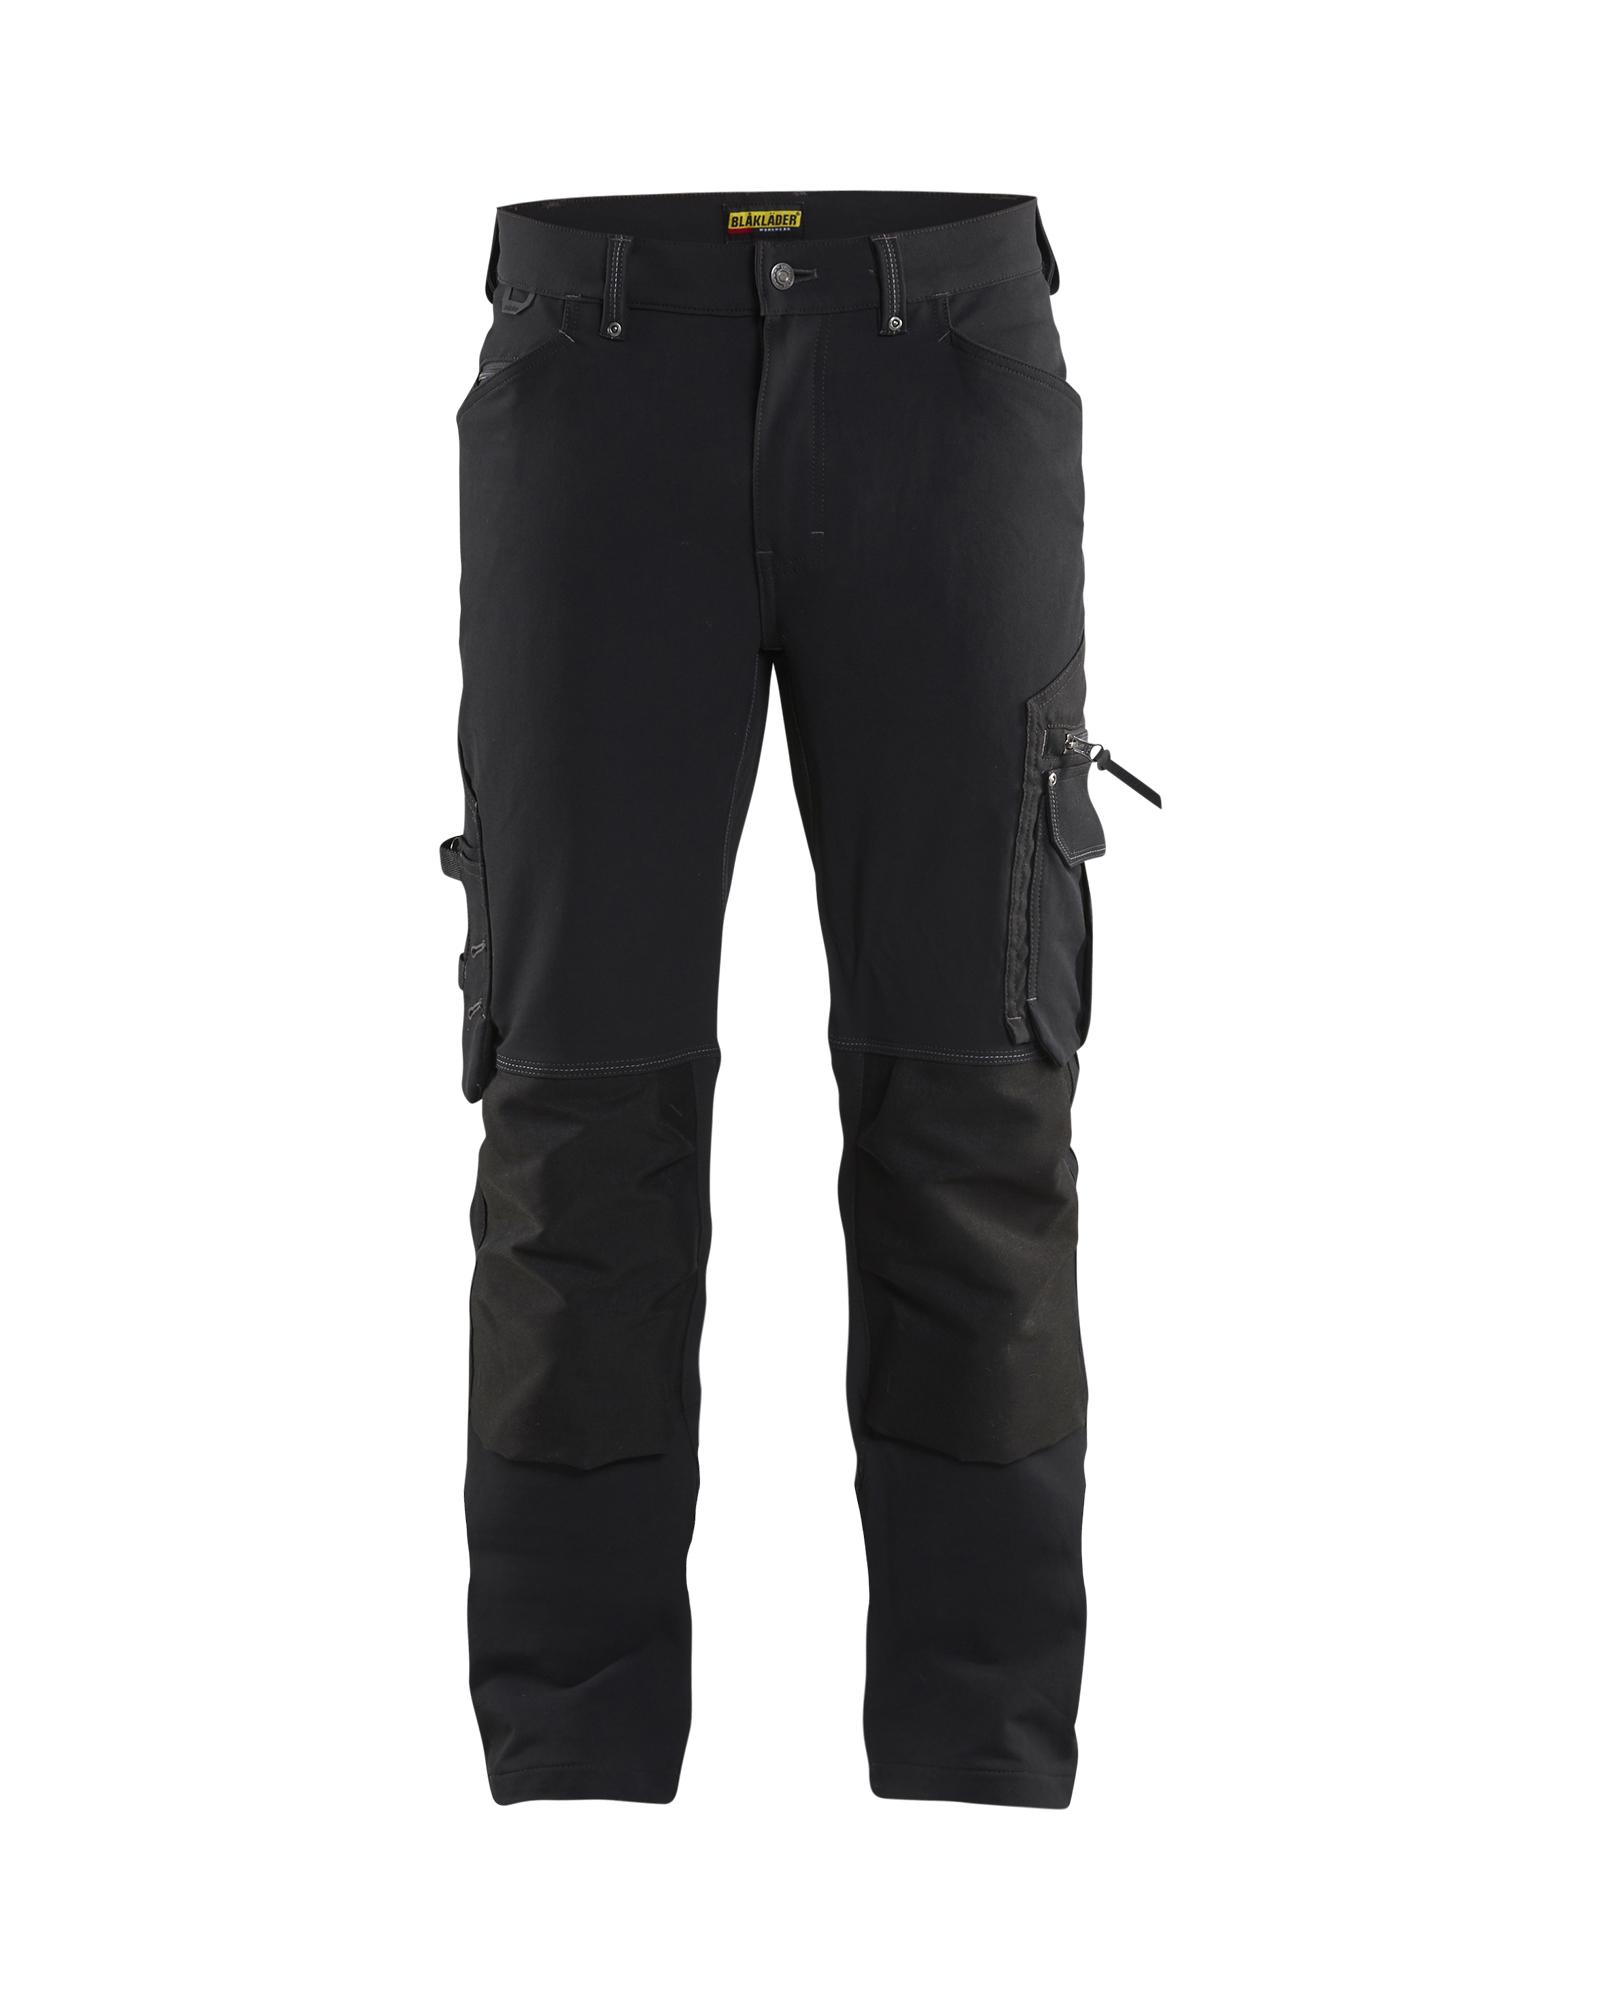 Werkbroek 4-weg stretch X1900 zonder spijkerzakken